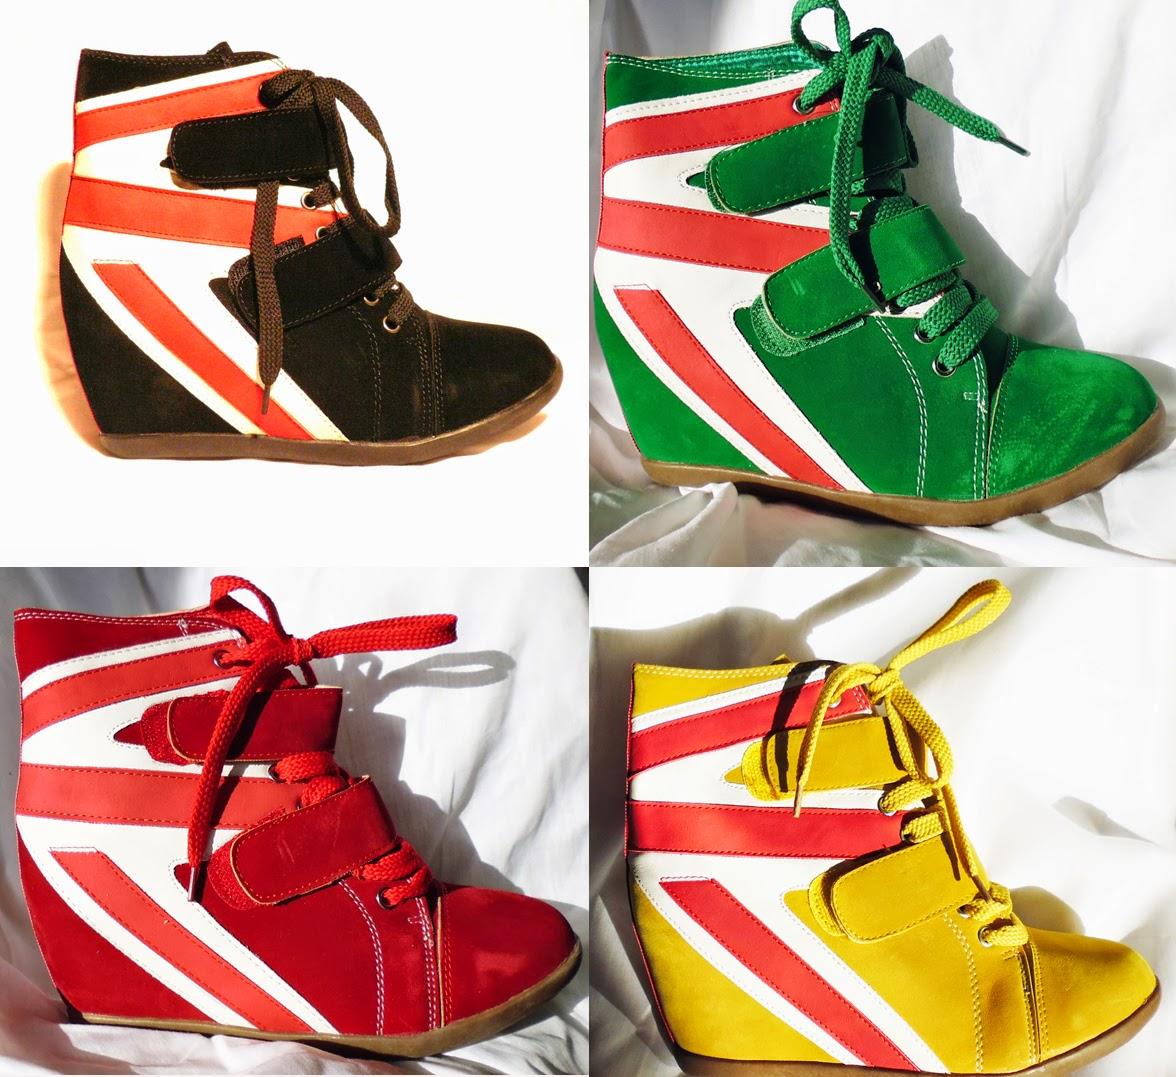 http://www.ebay.fr/itm/baskets-femme-sneakers-compensees-vert-vertes-rouges-rouge-noir-noires-jaune-/301539359877?ssPageName=STRK:MESE:IT